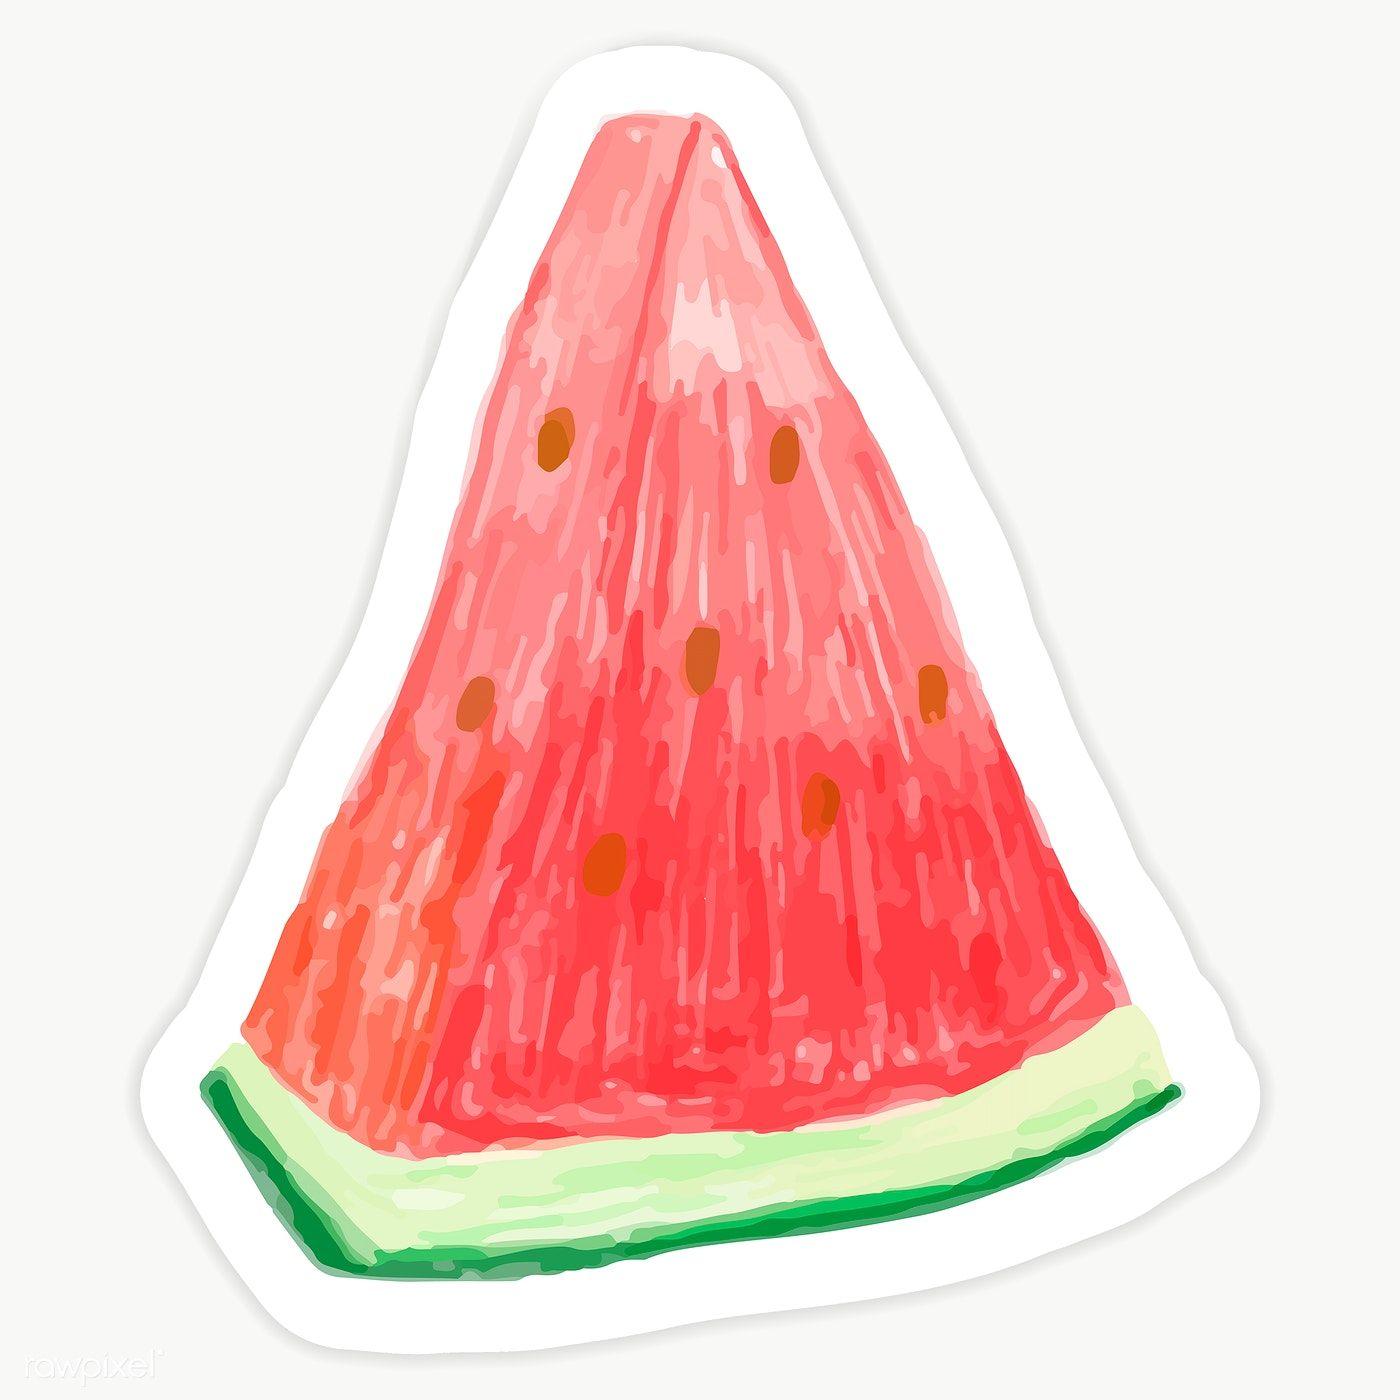 Watermelon Slice Isolated On Transparent Background Premium Image By Rawpixel Com Sasi Watermelon Fruit Cartoon Watermelon Slices